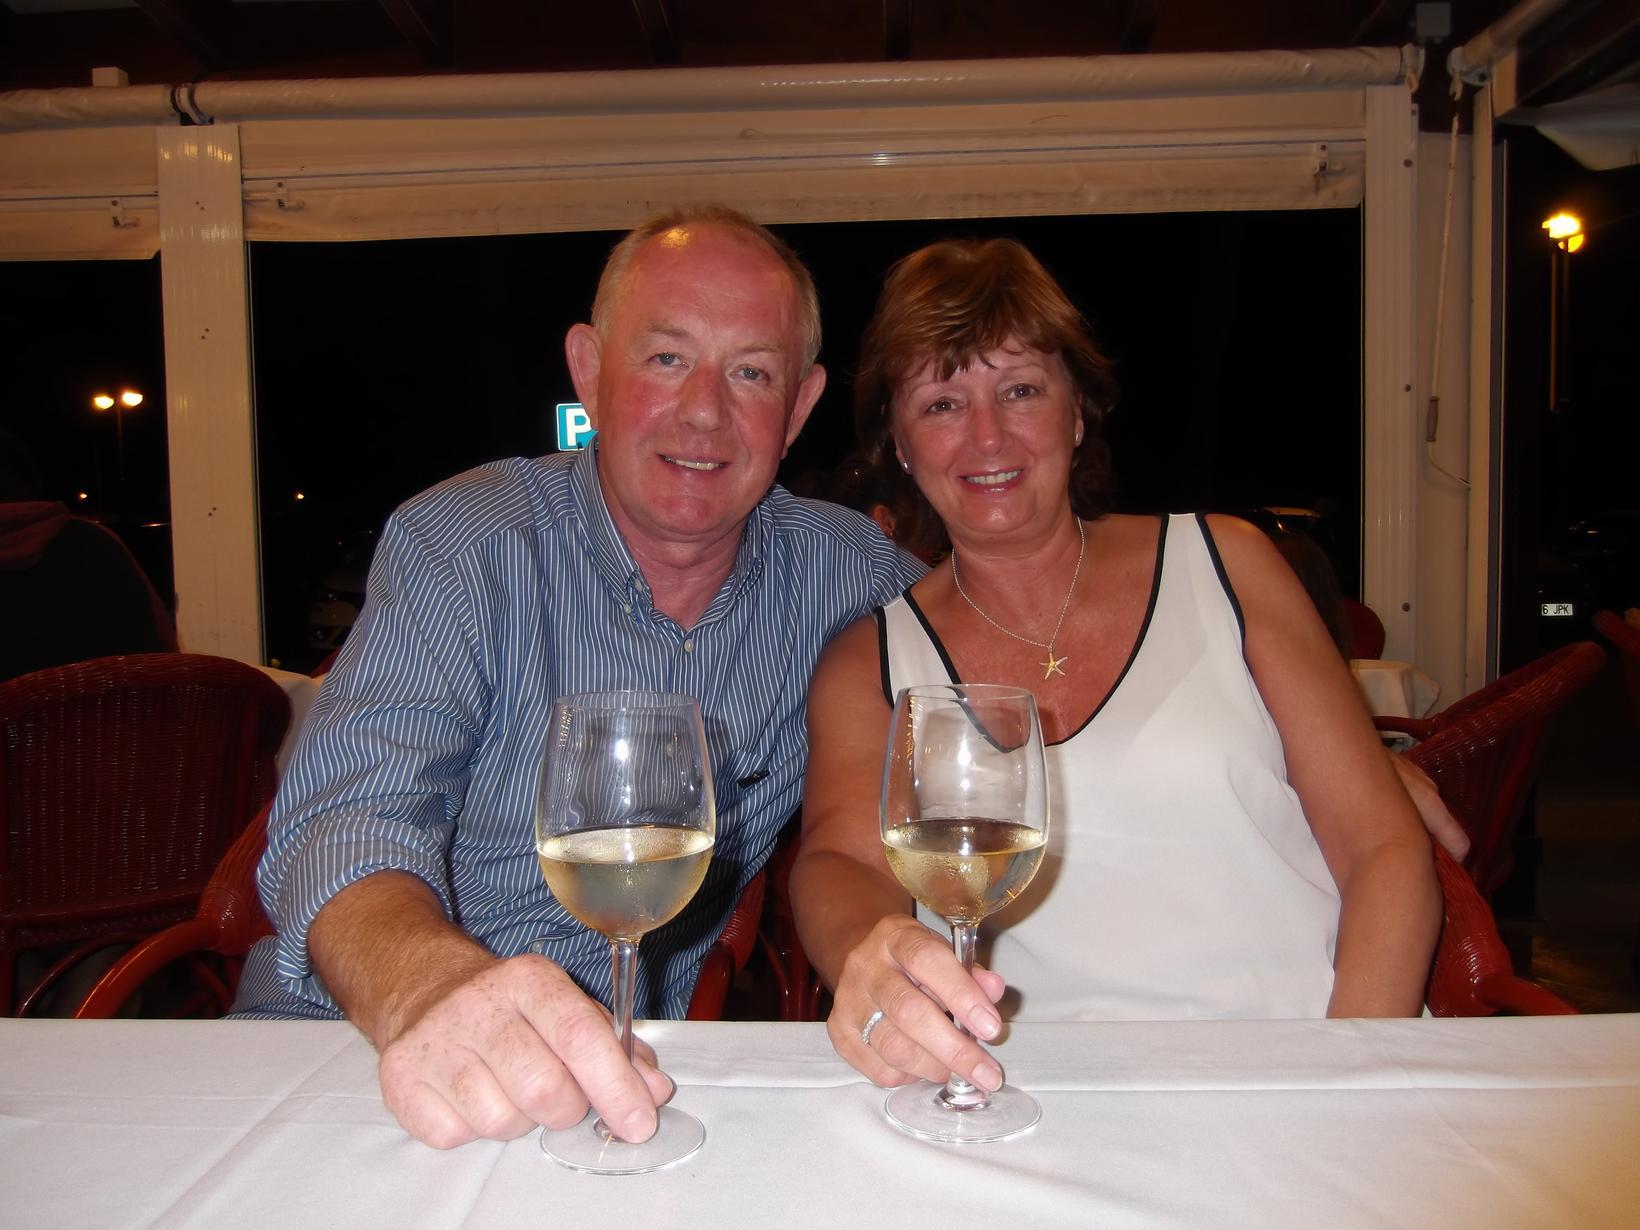 Helen & Alan peter from Douglas, Isle of Man